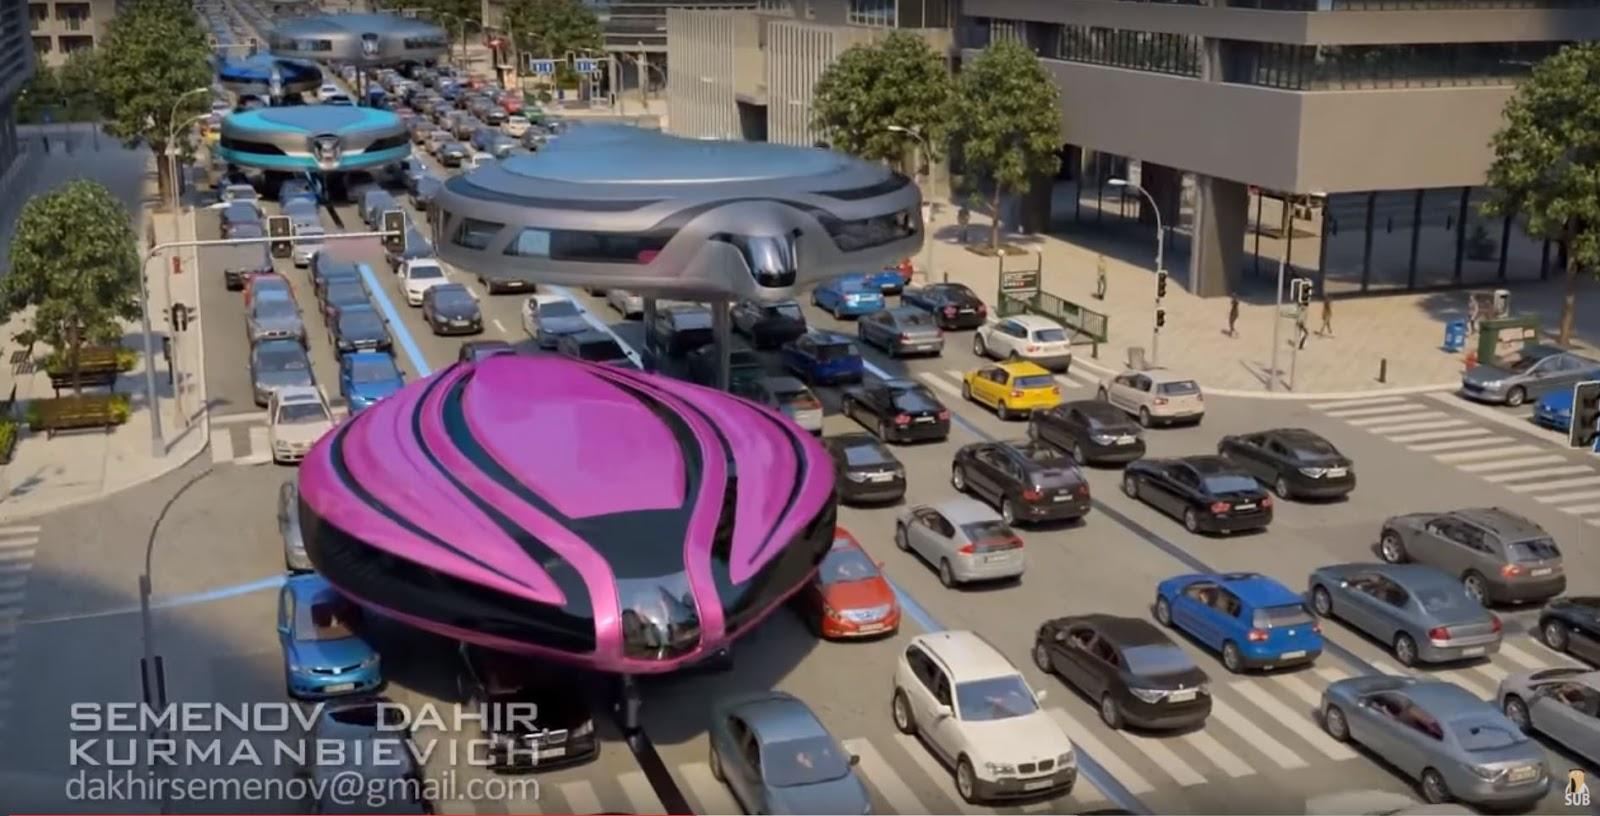 gyroscopic transportation